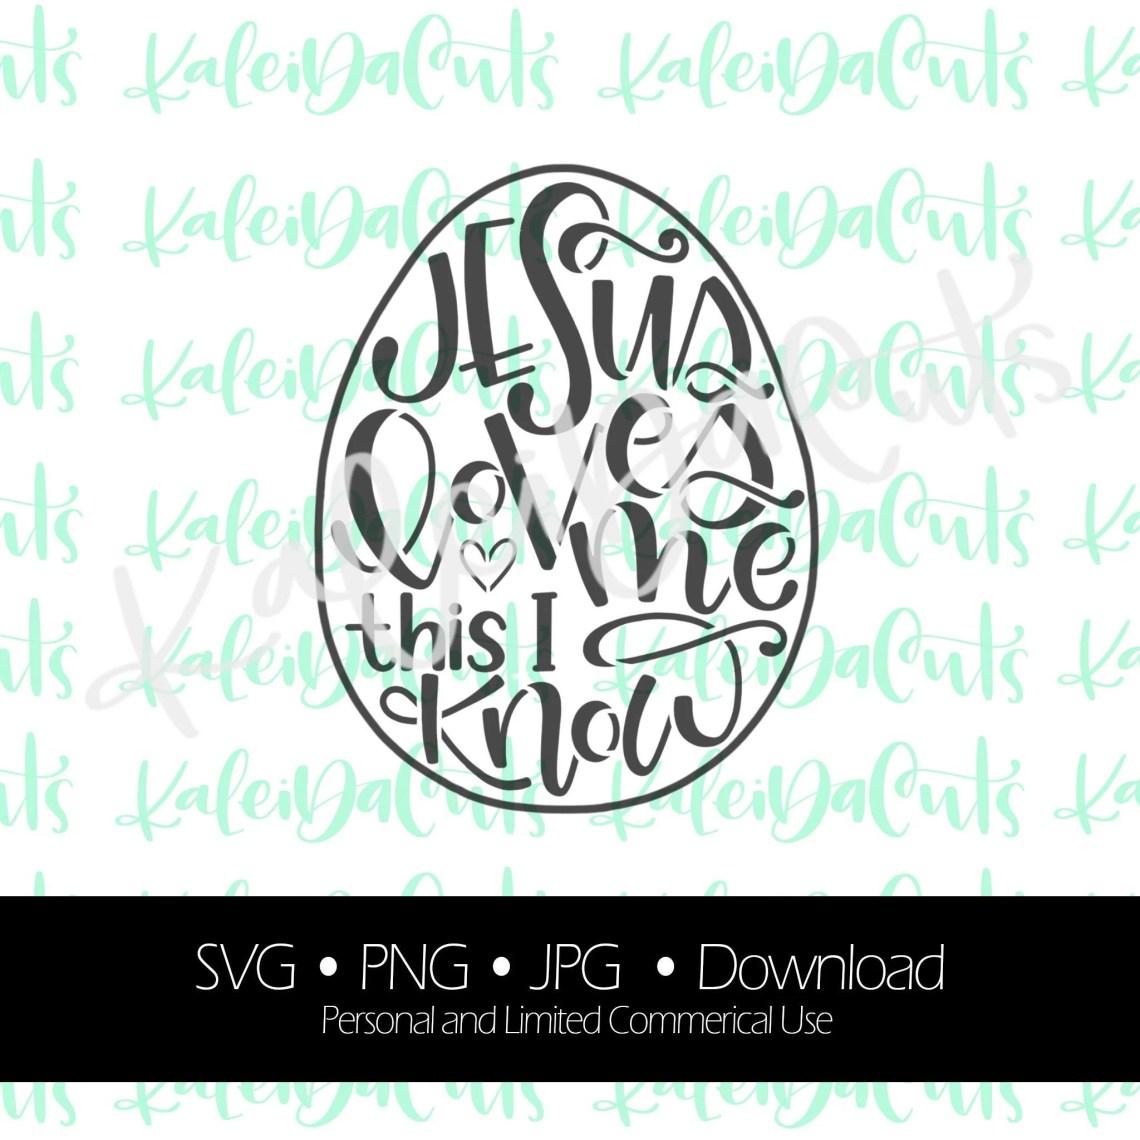 Download Jesus Loves Me This I Know Digital Download. - KaleidaCuts